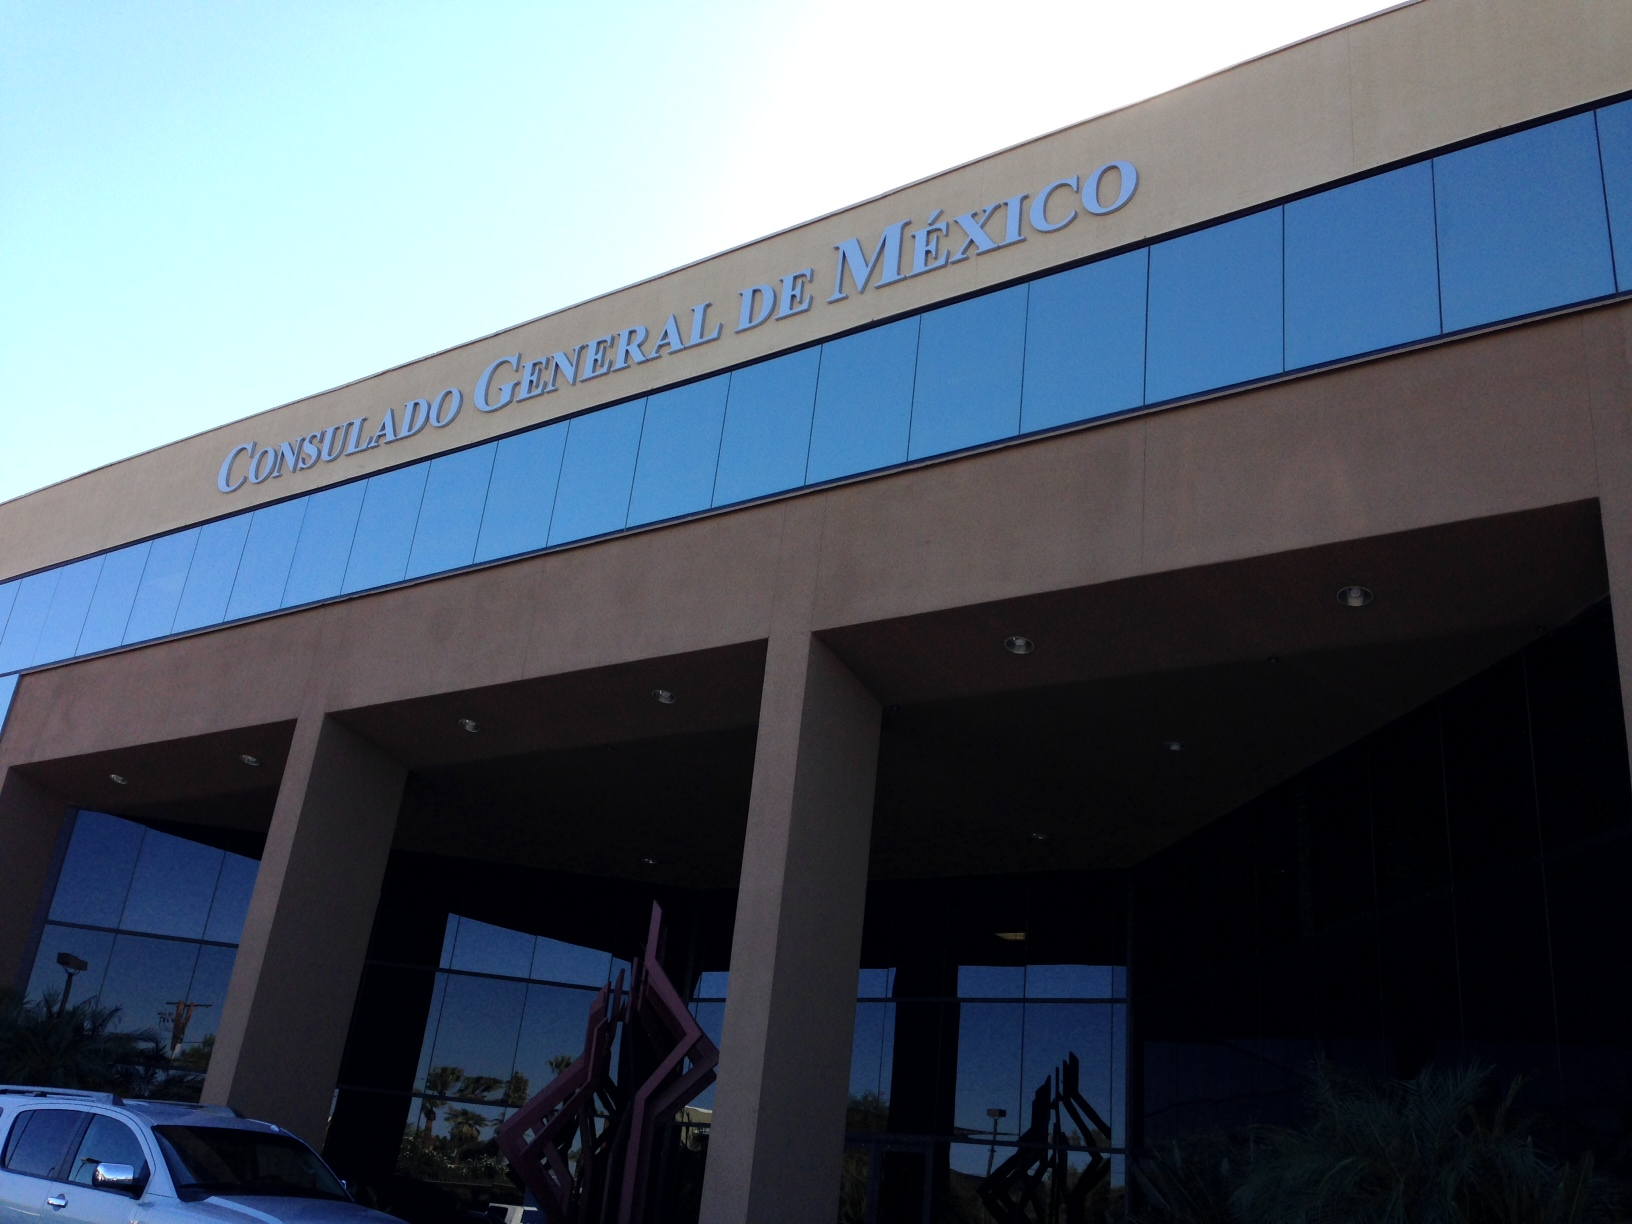 Consulado General de Mexico